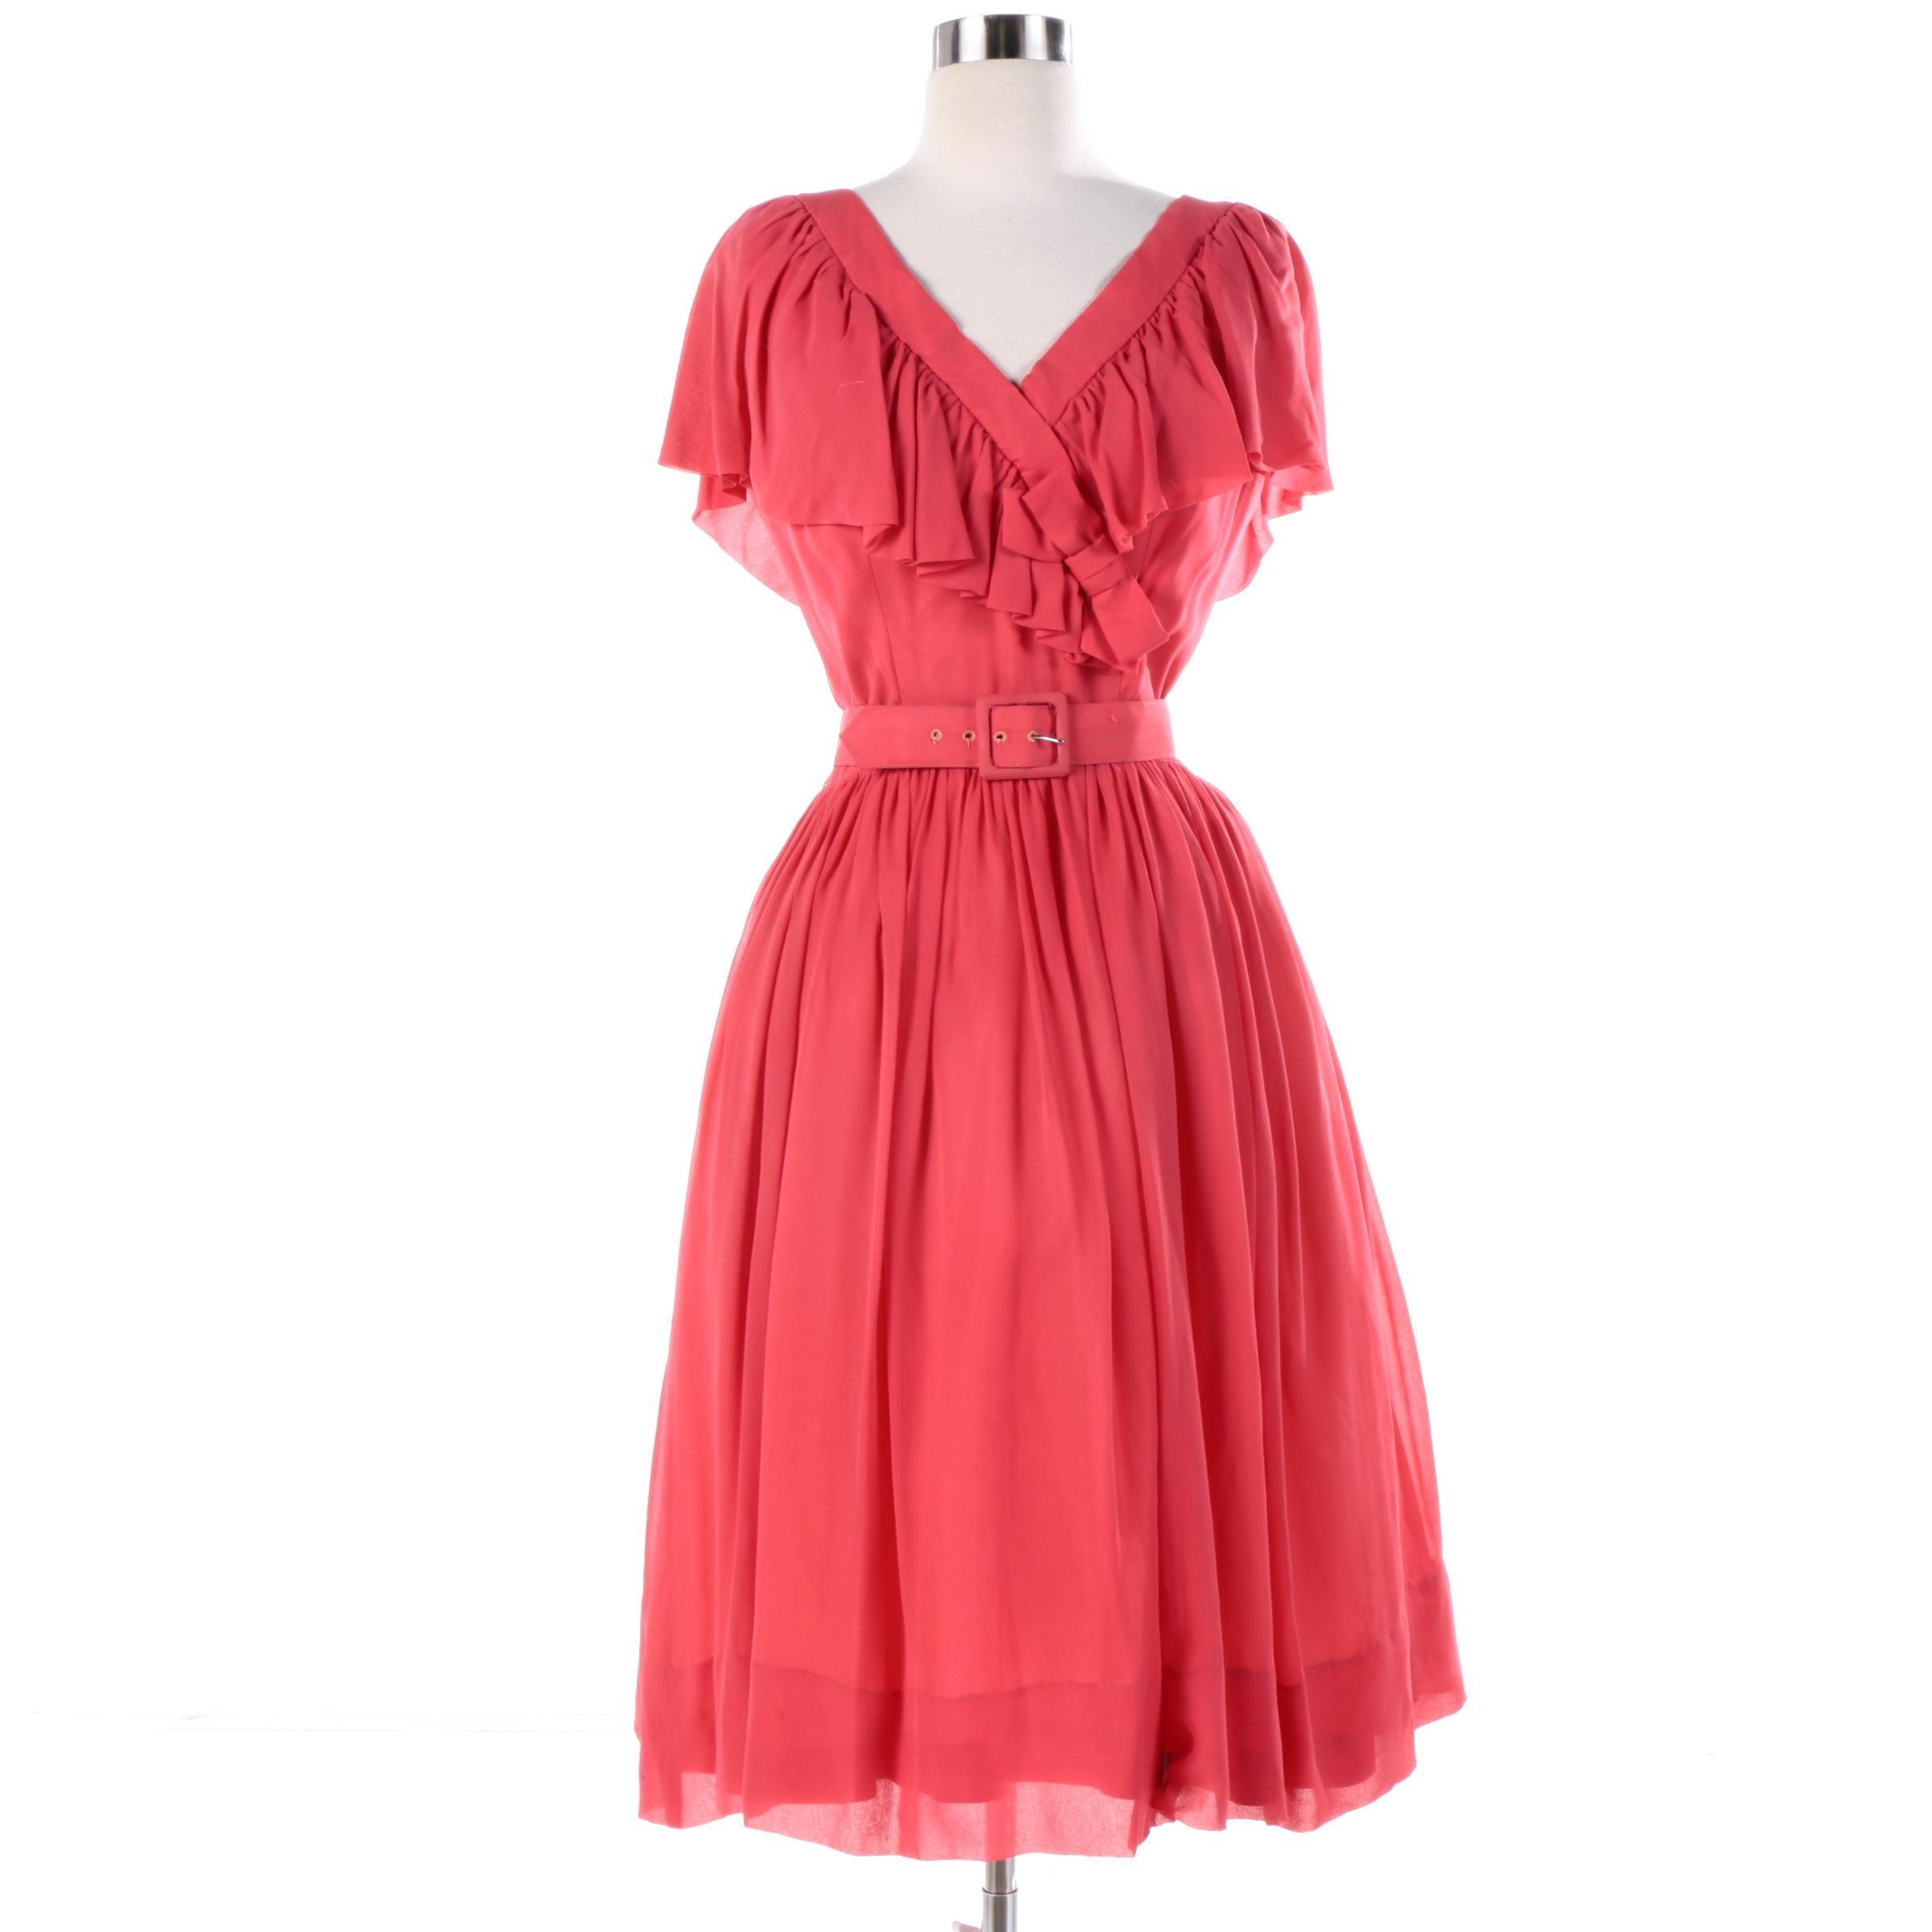 Circa 1950s Vintage Suzy Perette Chiffon Cocktail Dress